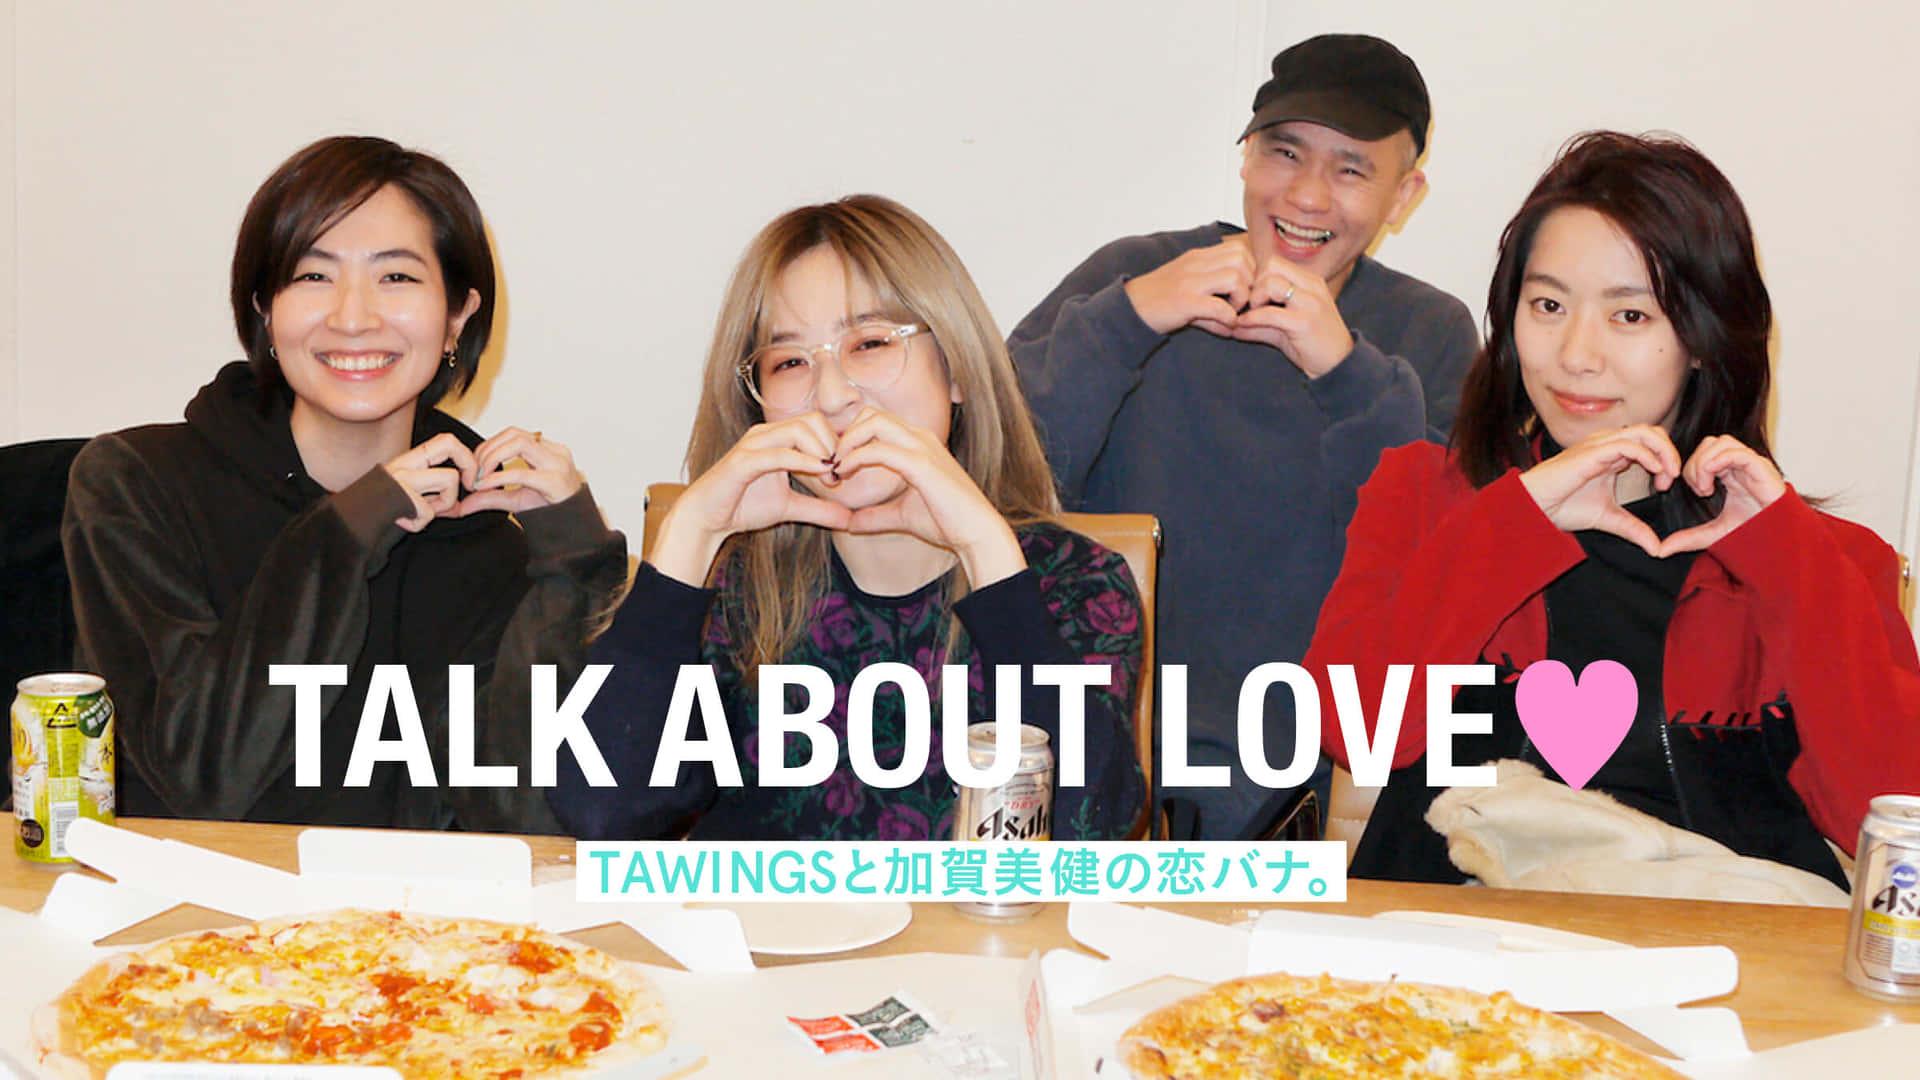 TAWINGSと加賀美健の恋バナ。